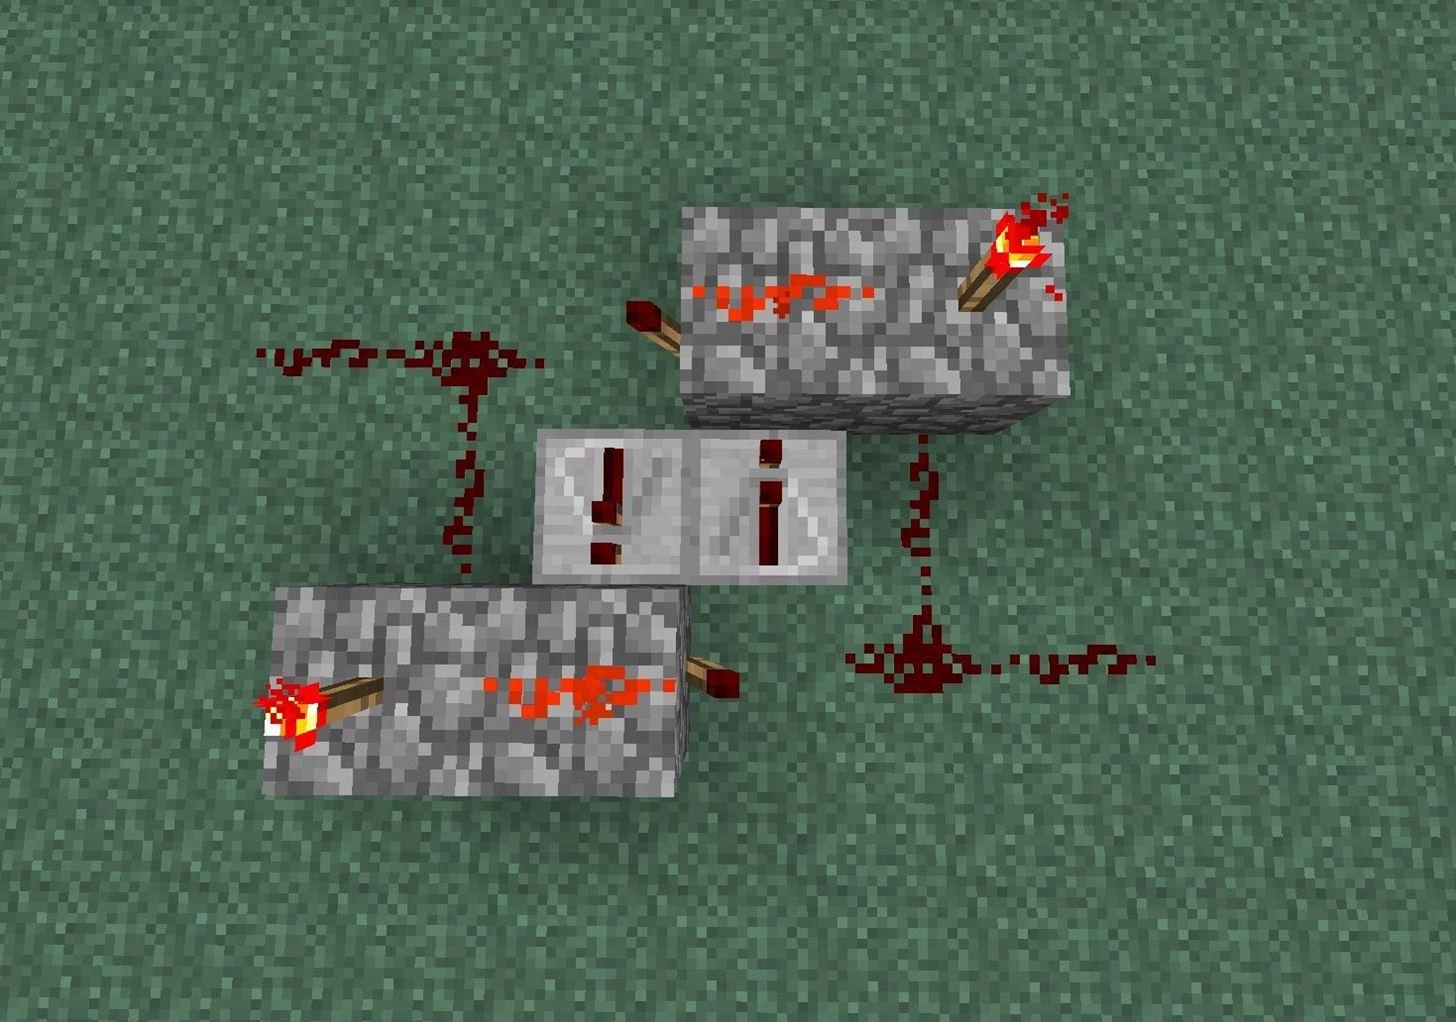 Basic Redstone Circuits 2 Basic Redstone Circuits 2 Diamonds